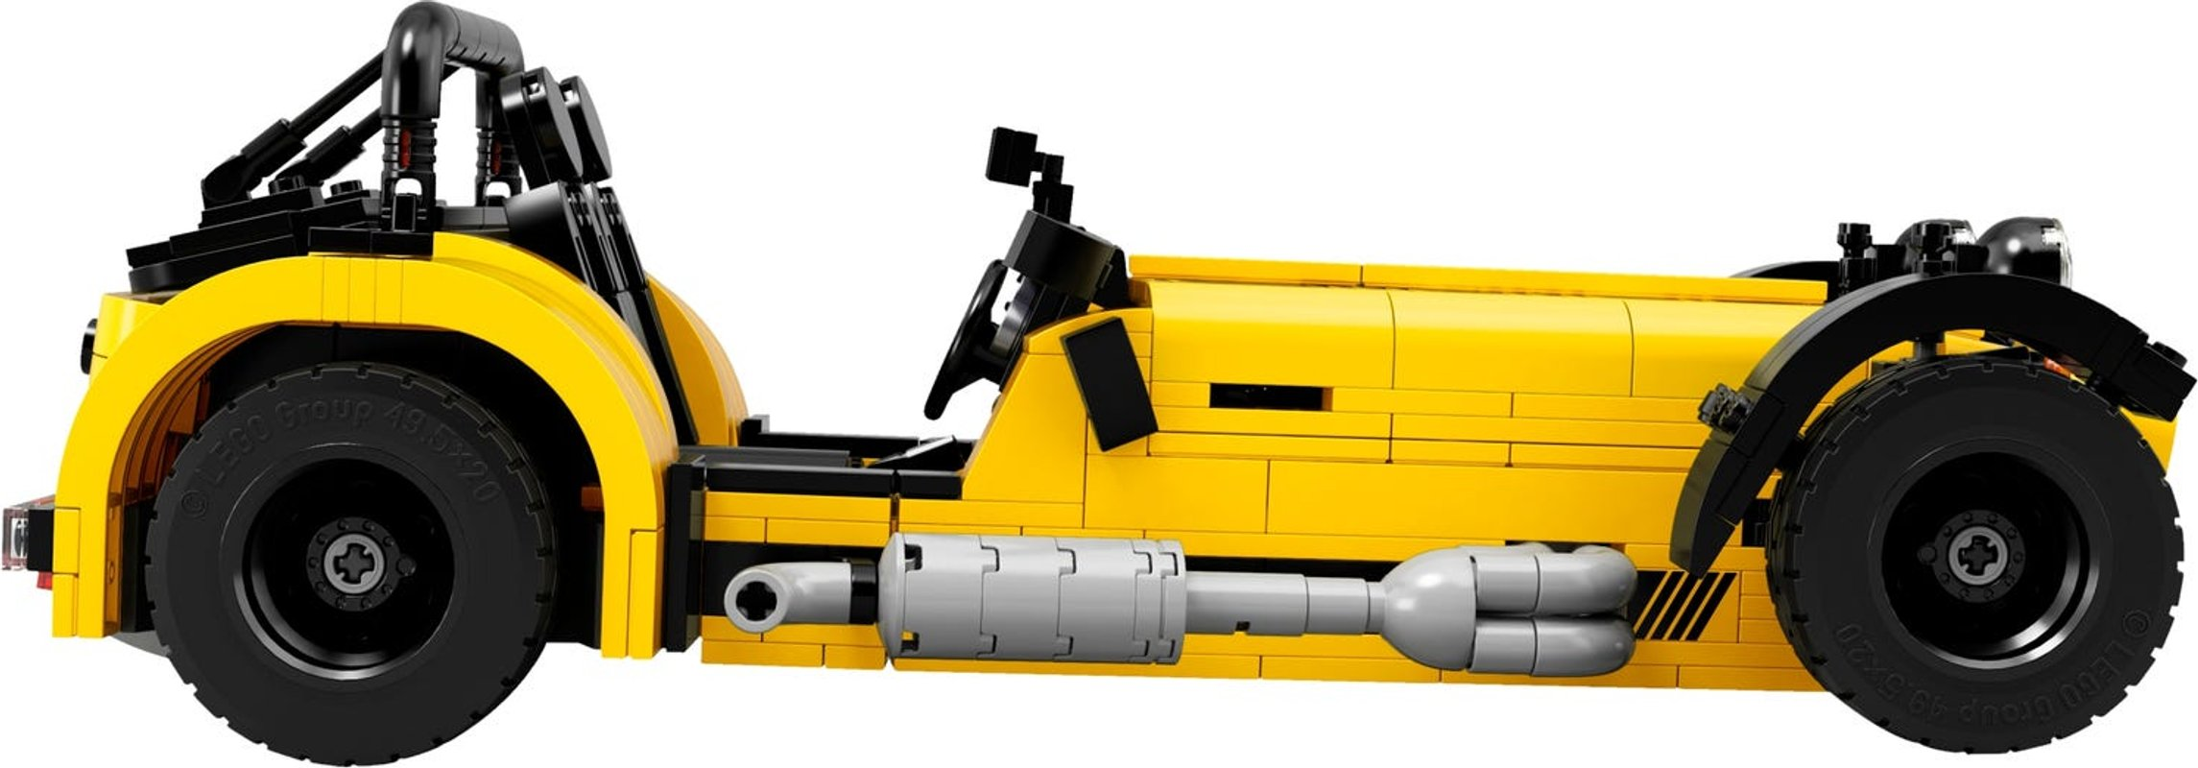 Caterham Seven 620R components